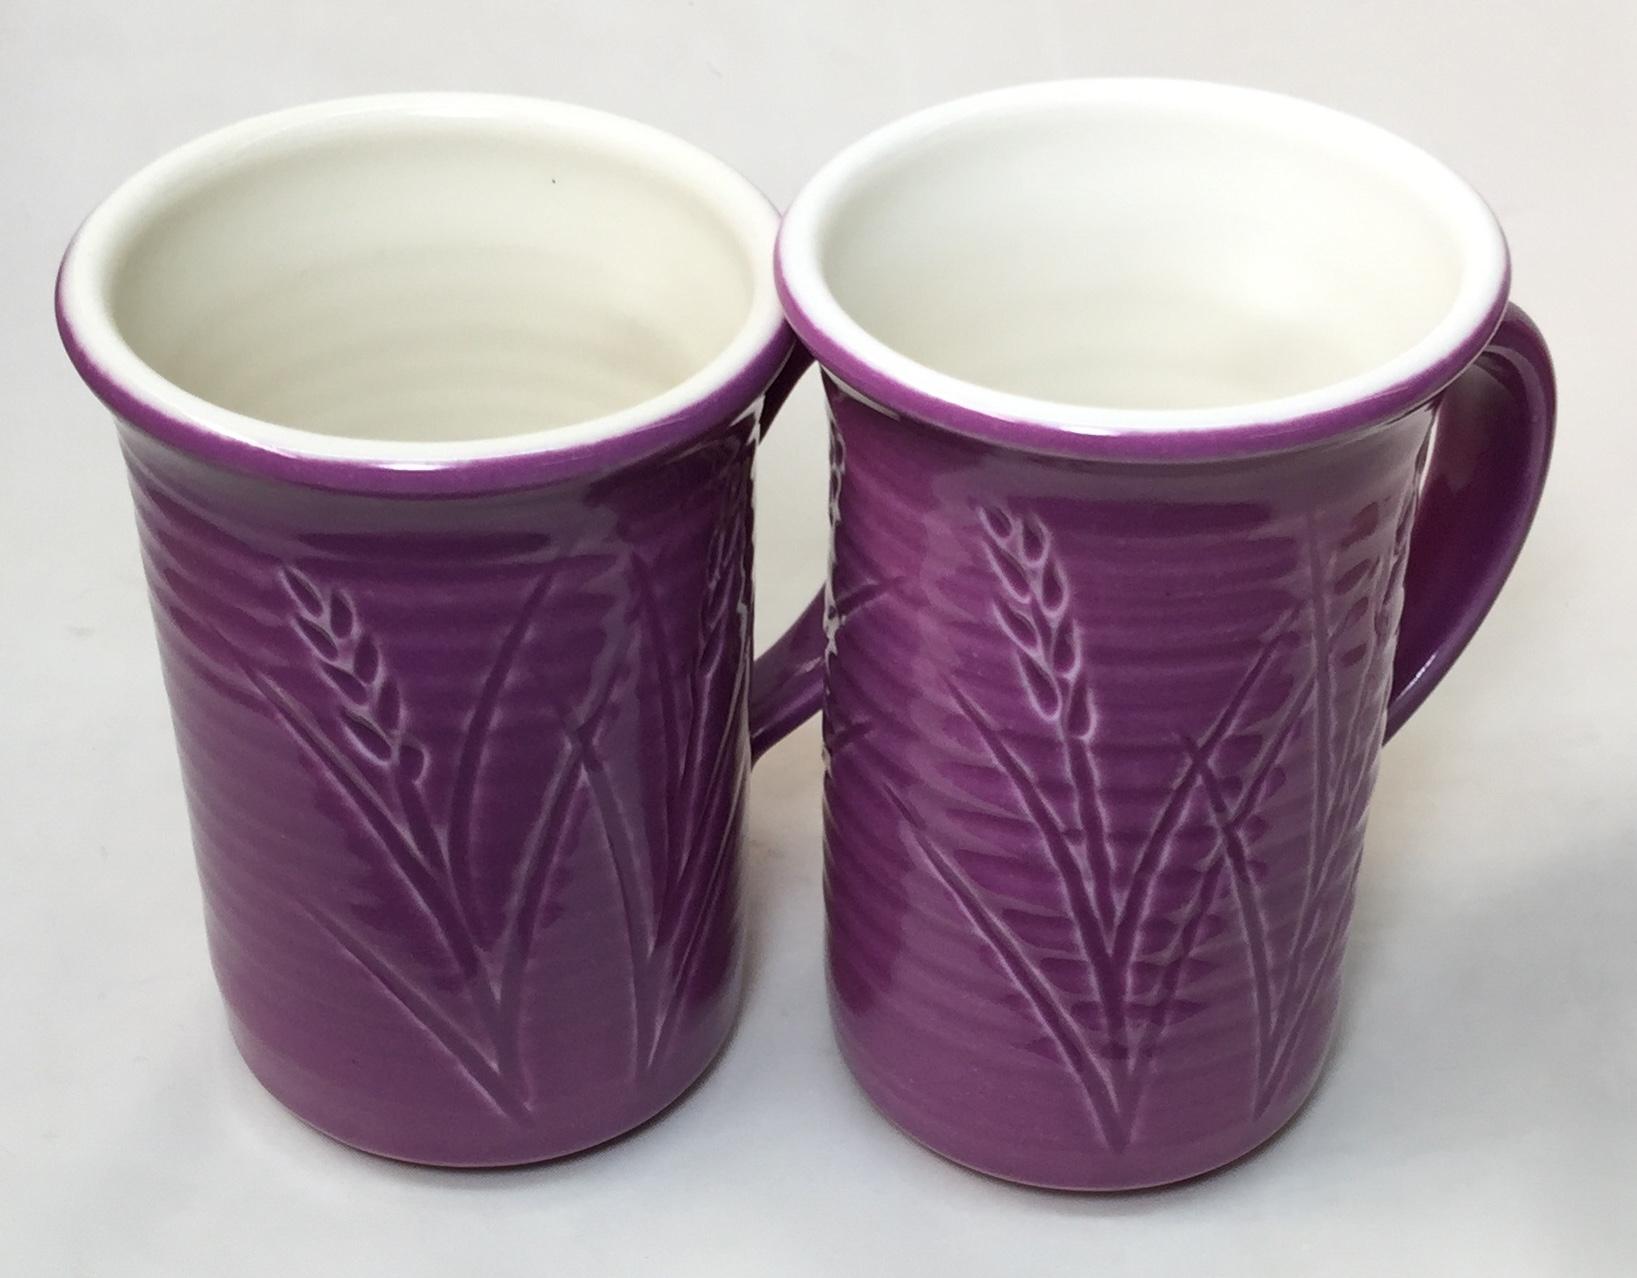 Two purple-outside, white inside thrown Grolleg cone 6 porcelain mugs